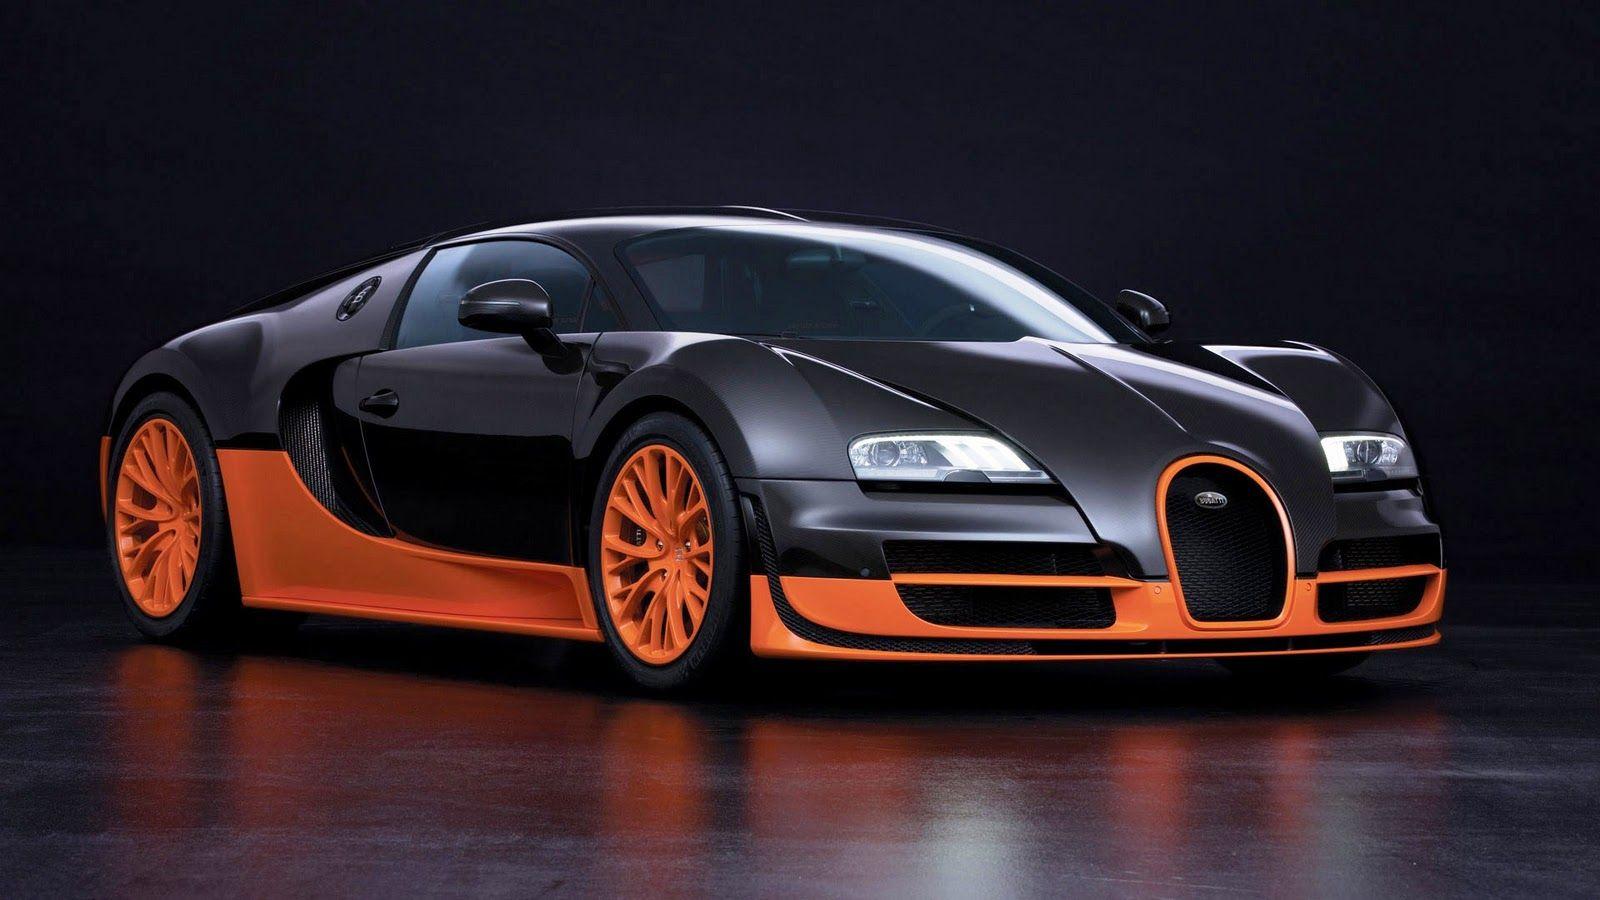 2011 Bugatti Veyron 16 4 Super Sport Bugatti Veyron Bugatti Veyron 16 Bugatti Wallpapers